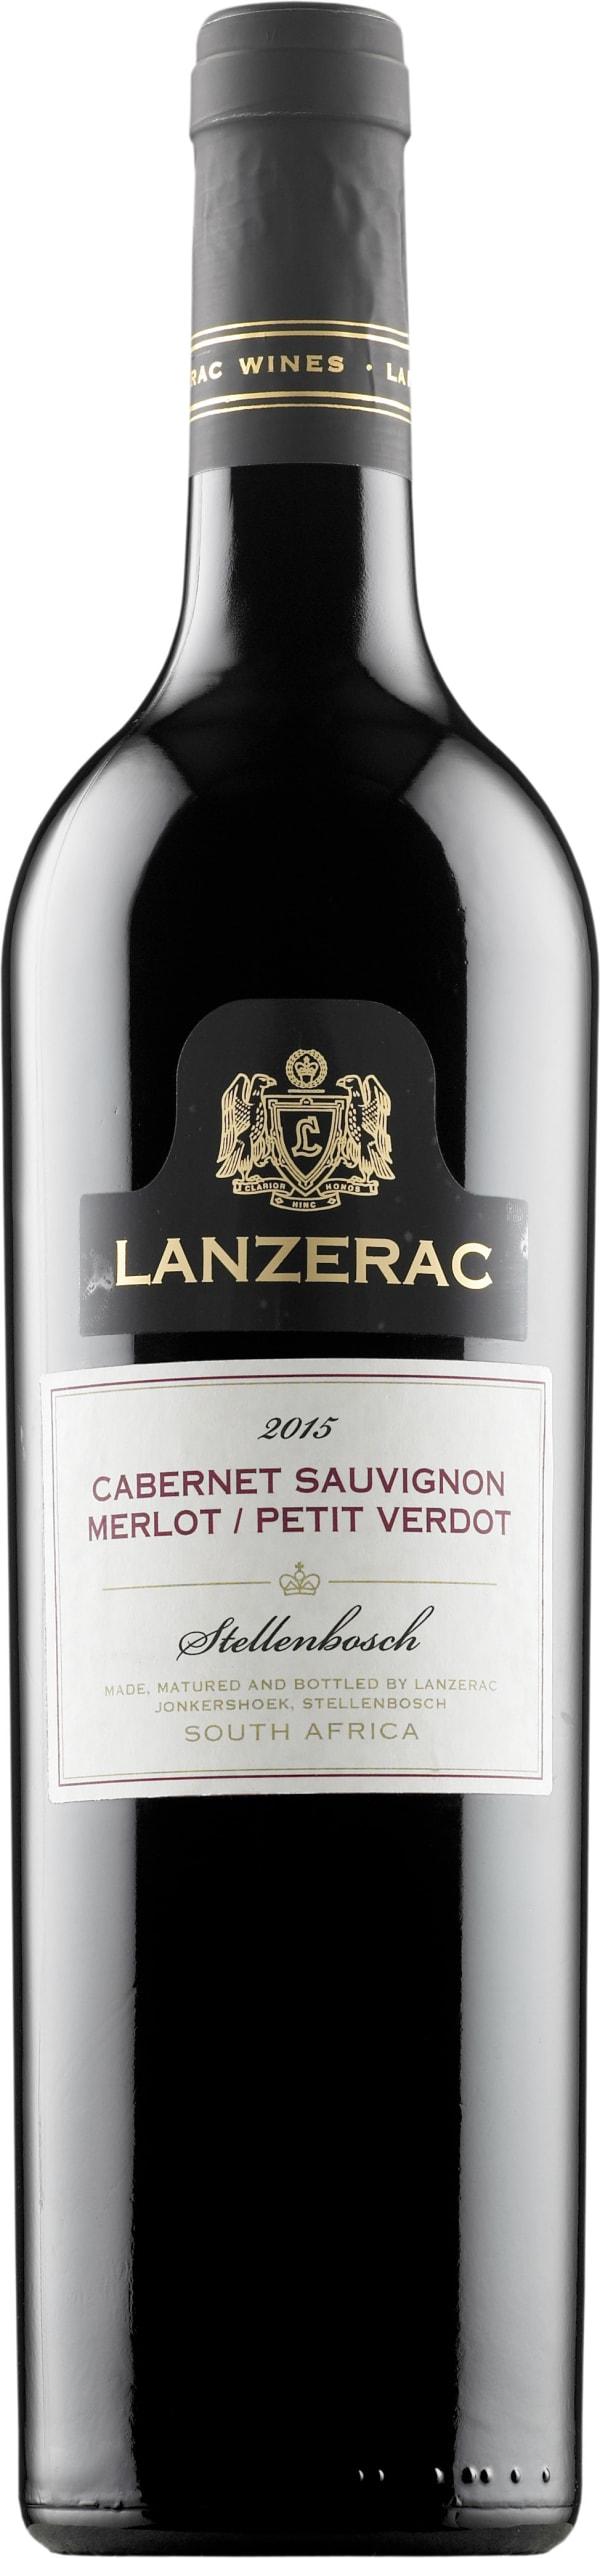 Lanzerac Cabernet Sauvignon Merlot Petit Verdot 2015